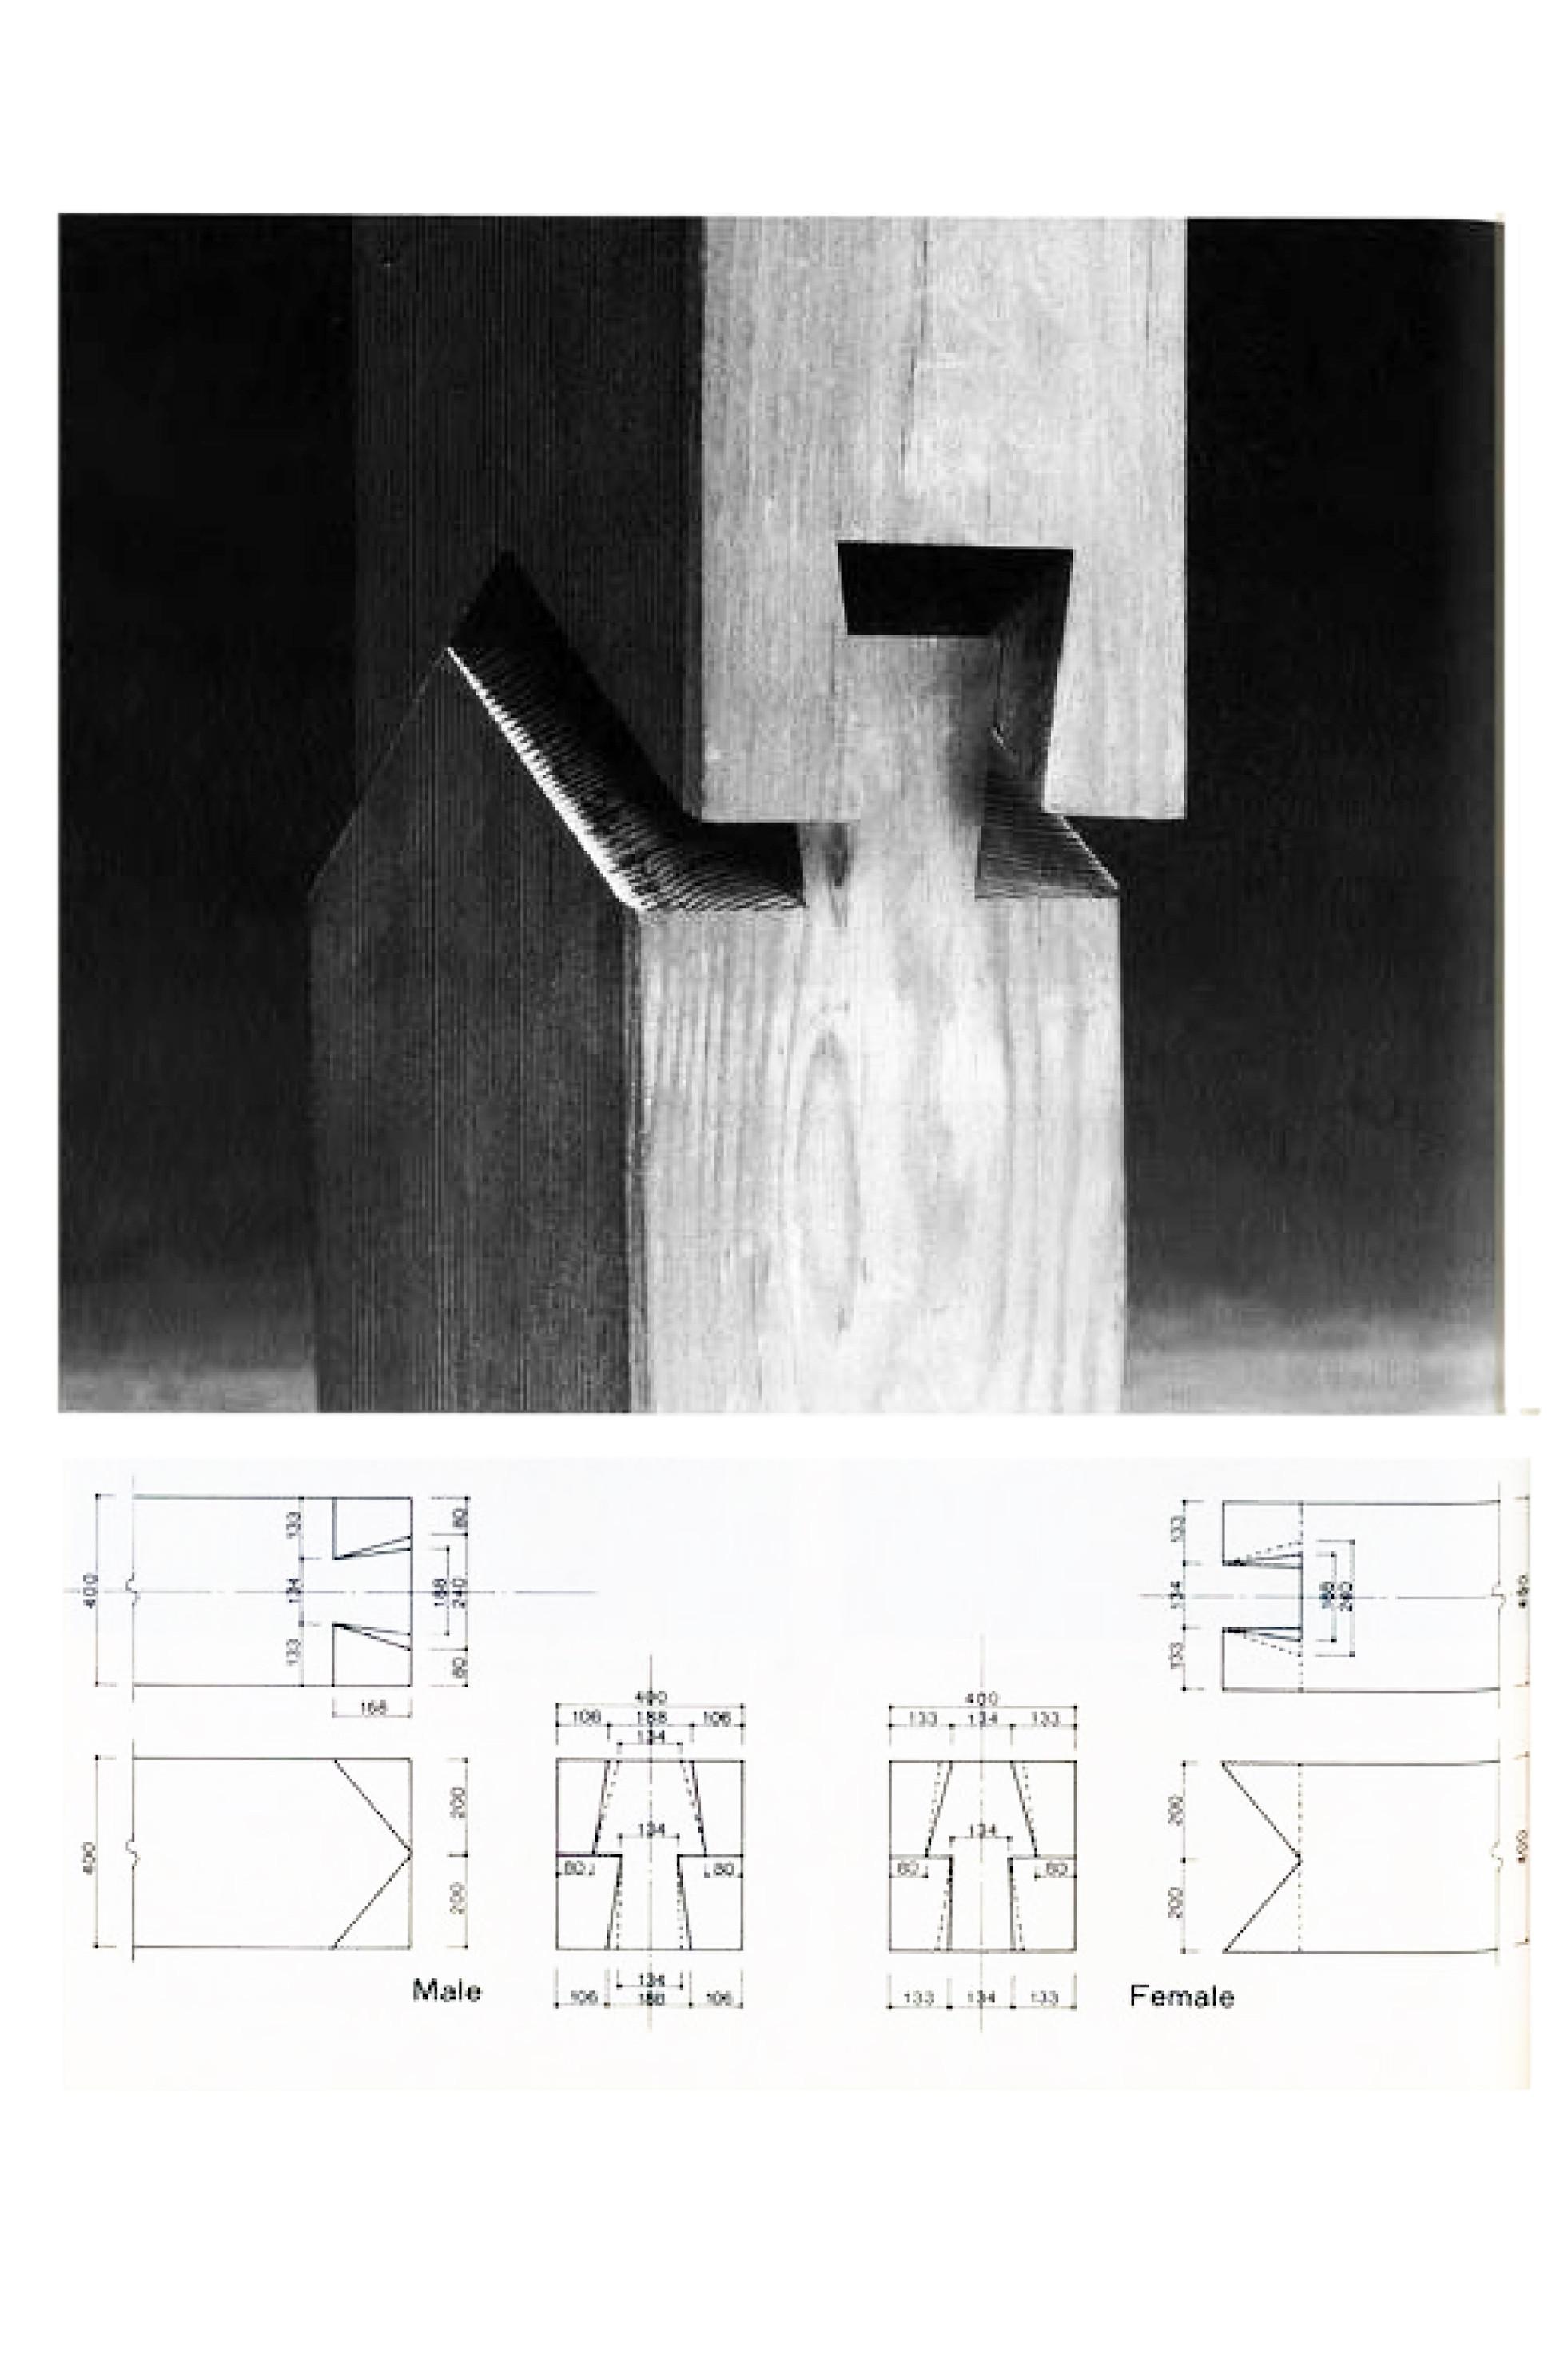 Galer a de en detalle especial los ensambles de madera - Arquitectura en madera ...